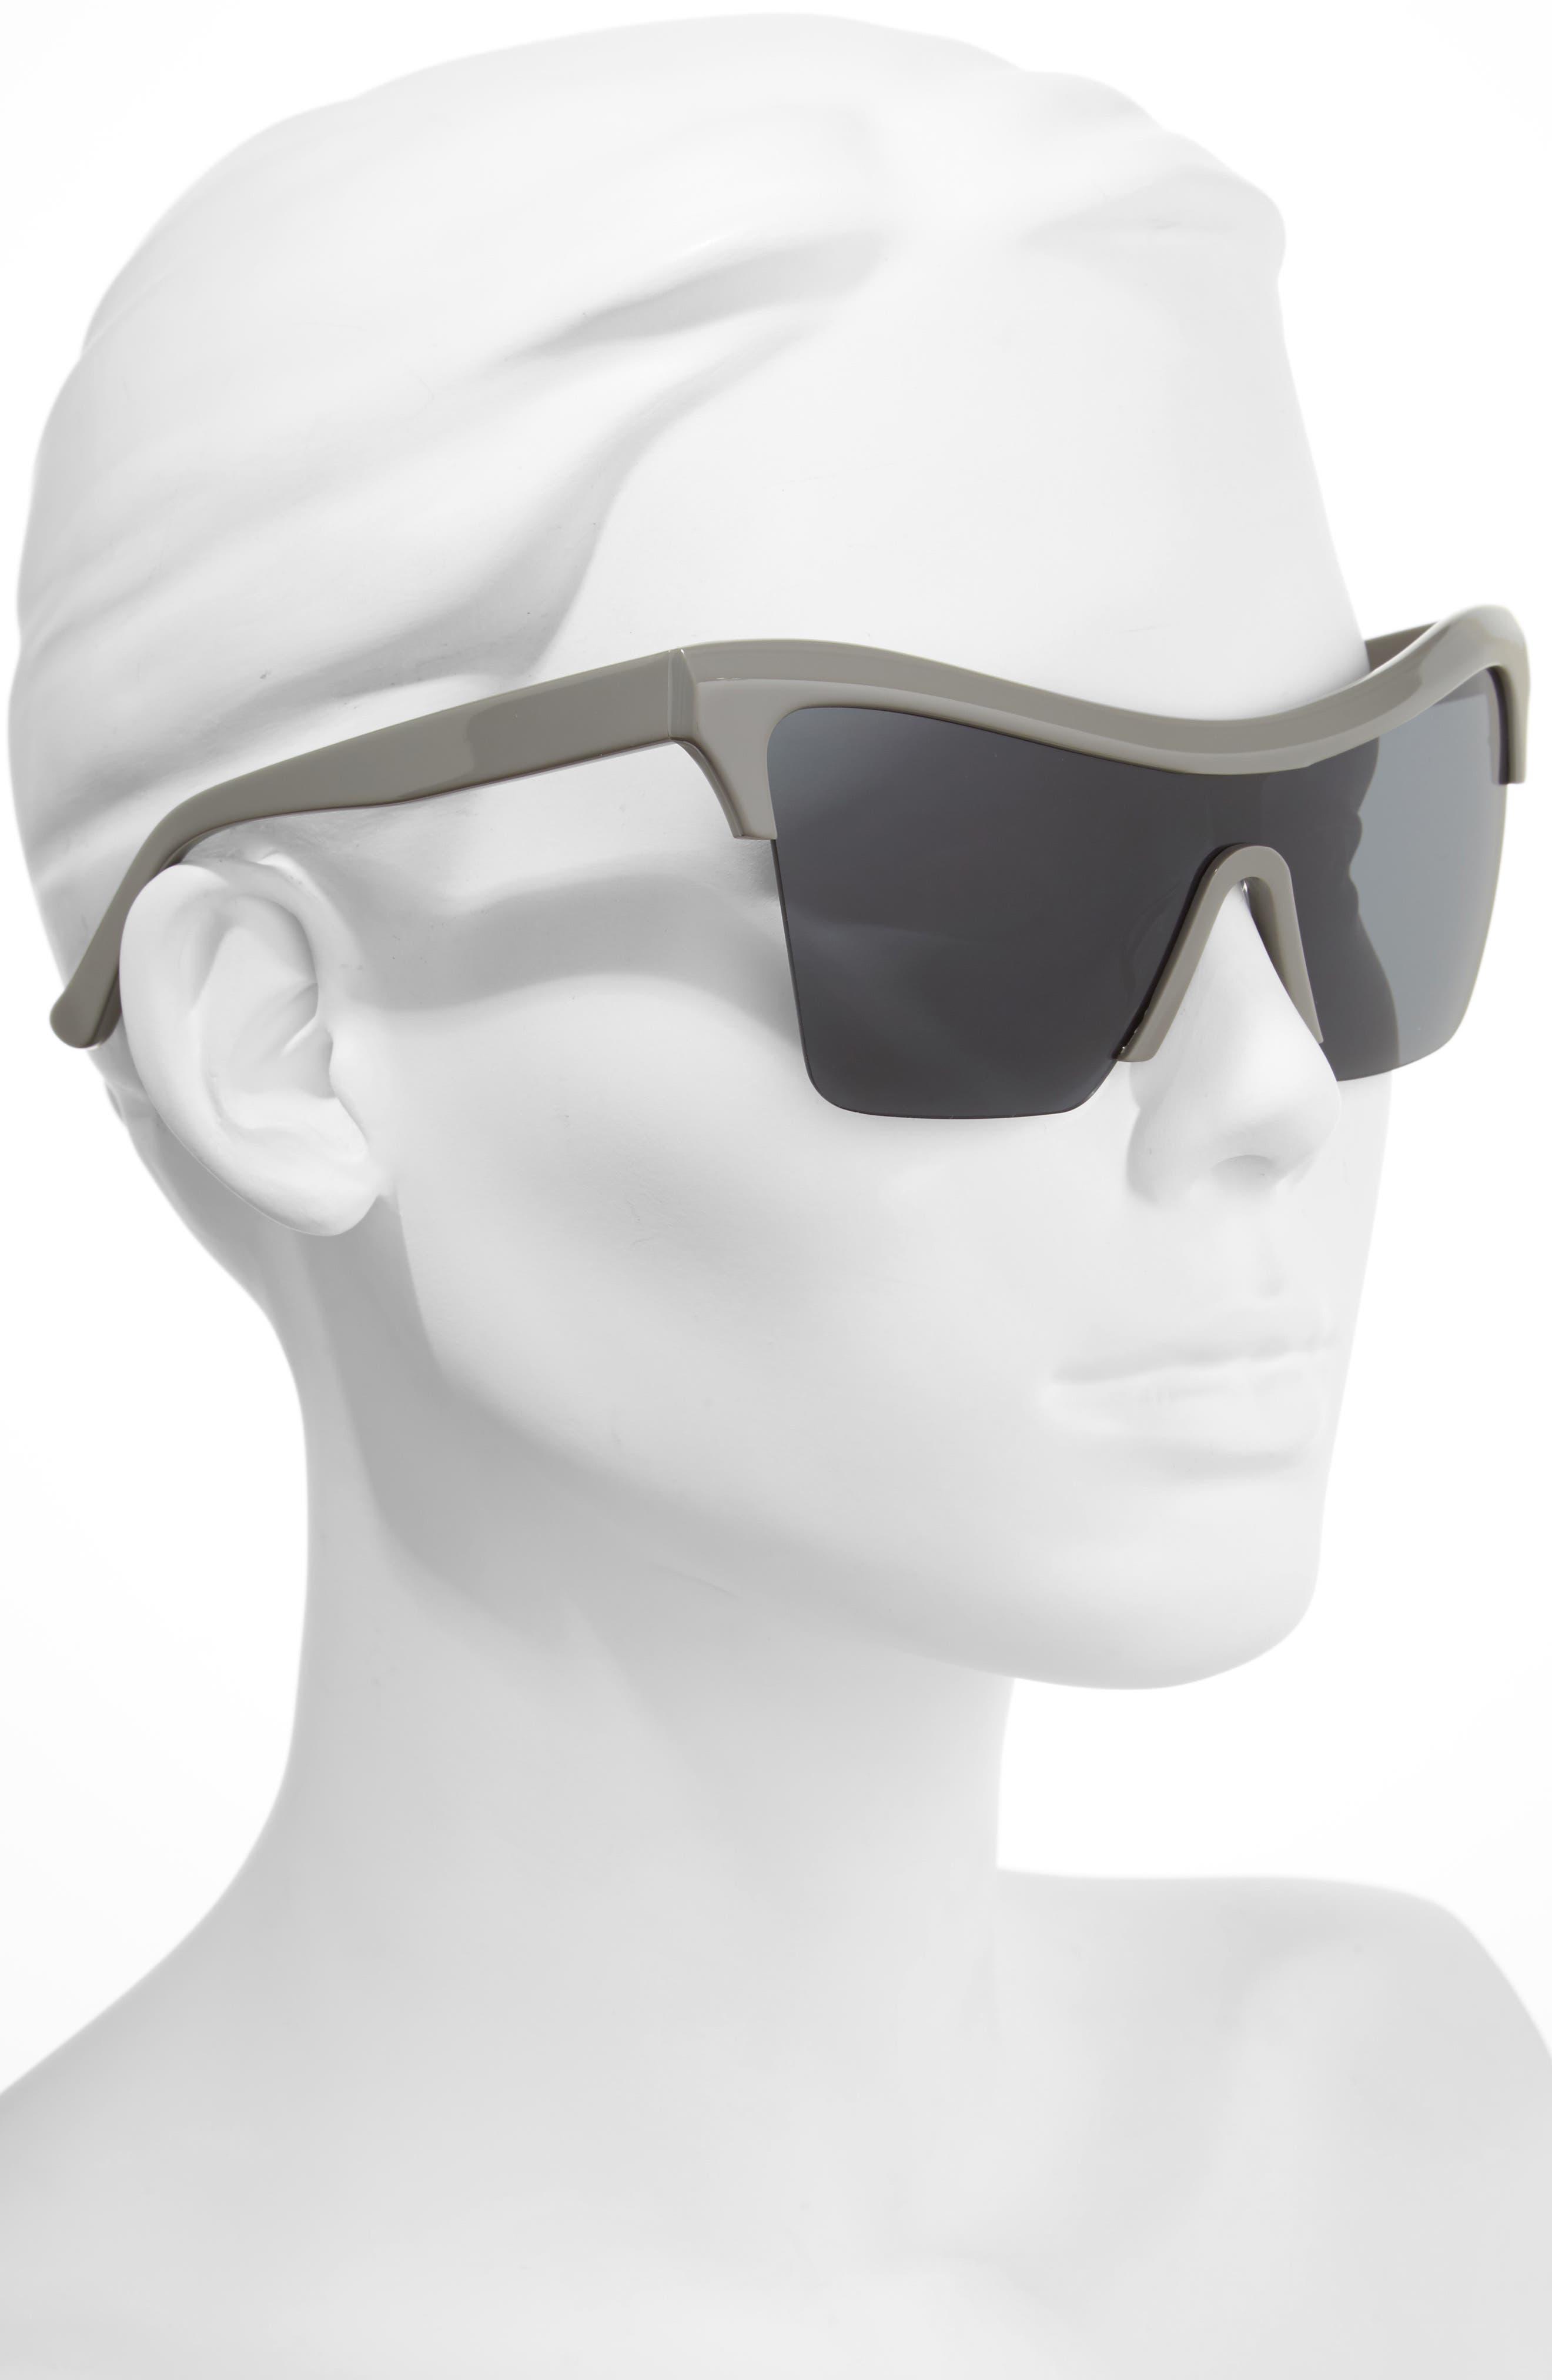 Passport Control 68mm Sunglasses,                             Alternate thumbnail 2, color,                             Grey